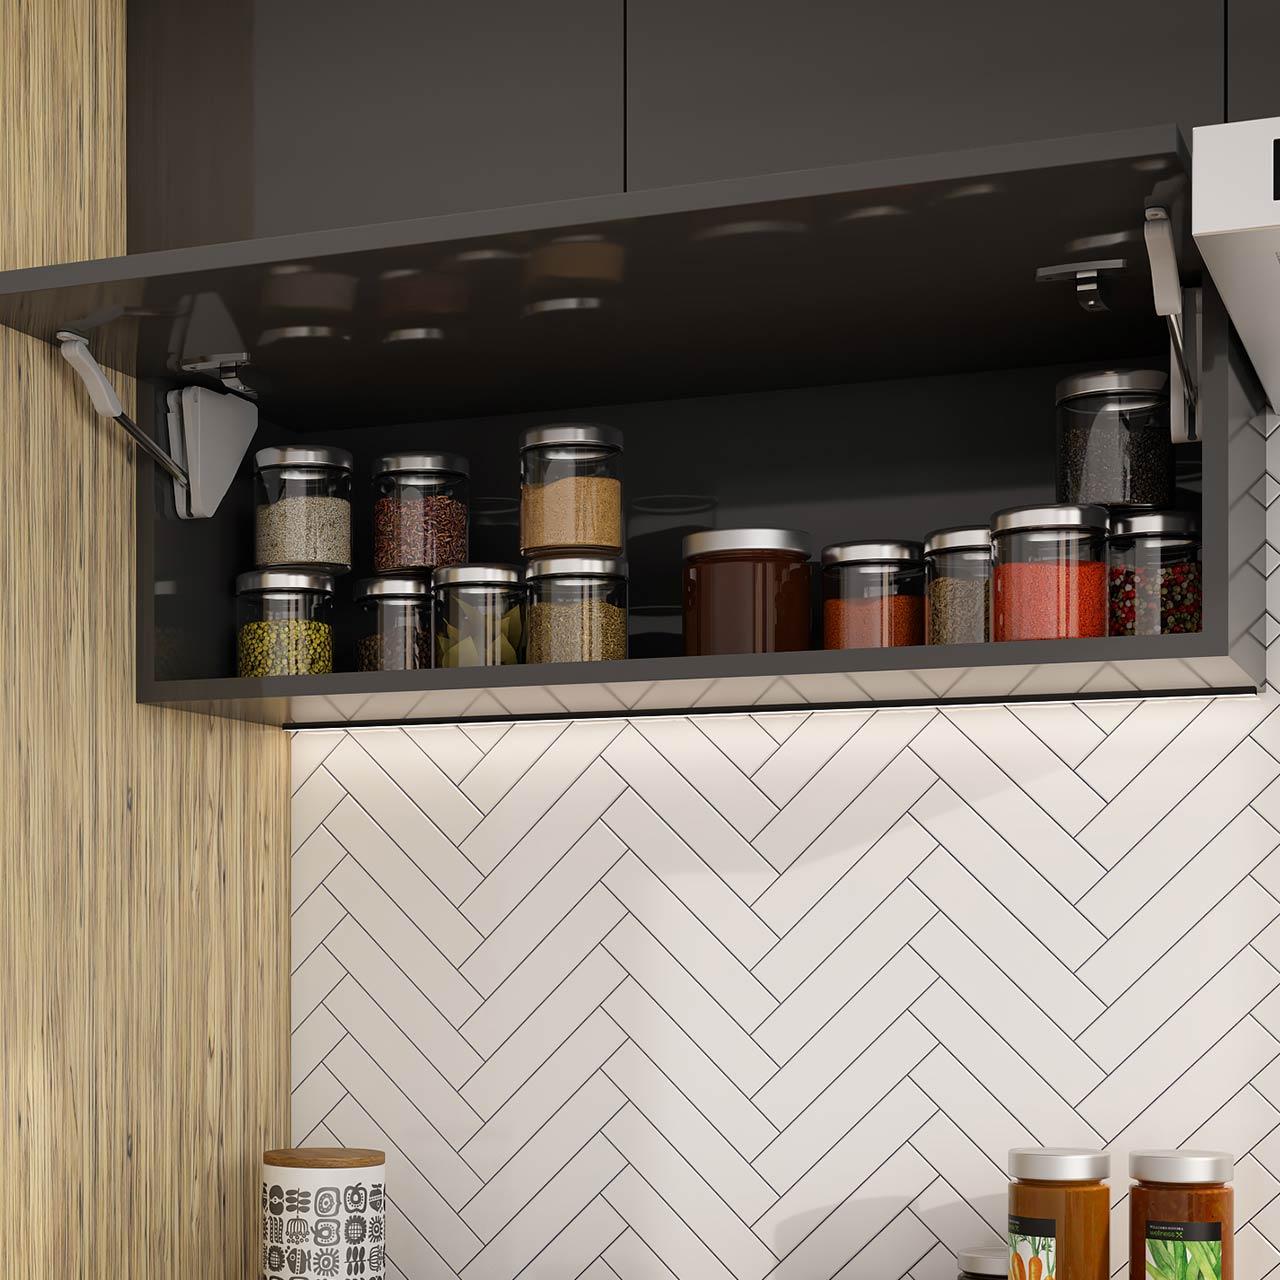 Kitchen Lifts to enhance storage space in your Modular Kitchen.